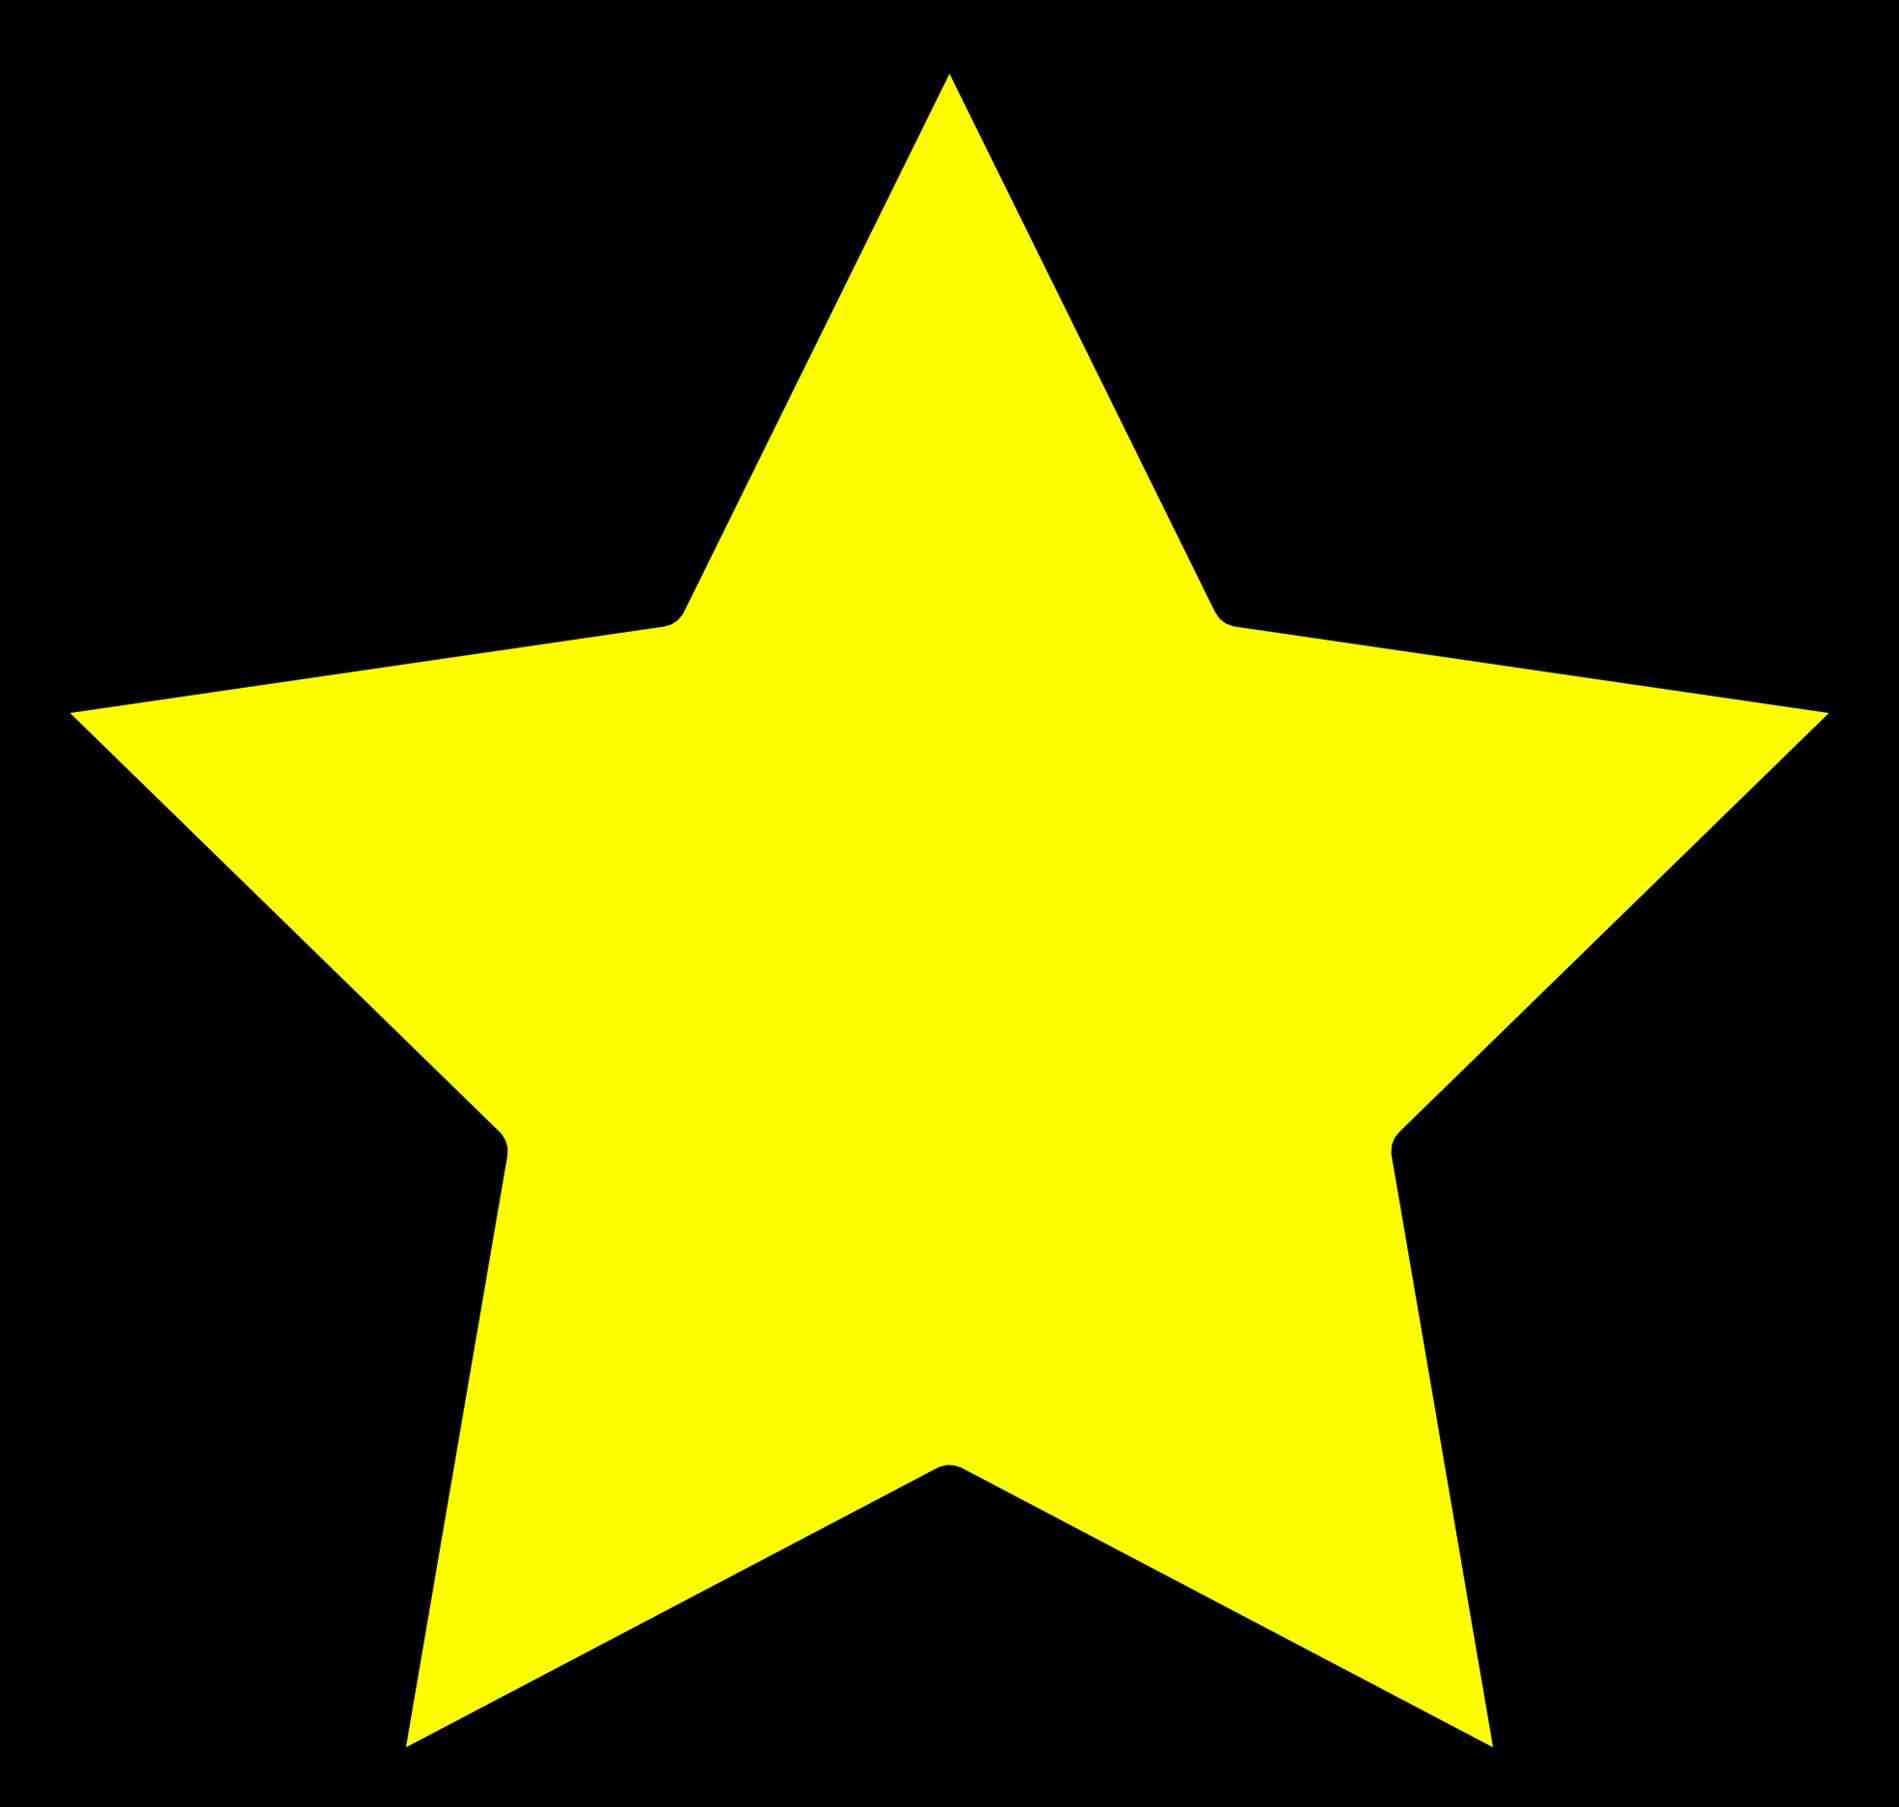 1899x1807 Christmas Star Clip Art Outline Cheminee.website